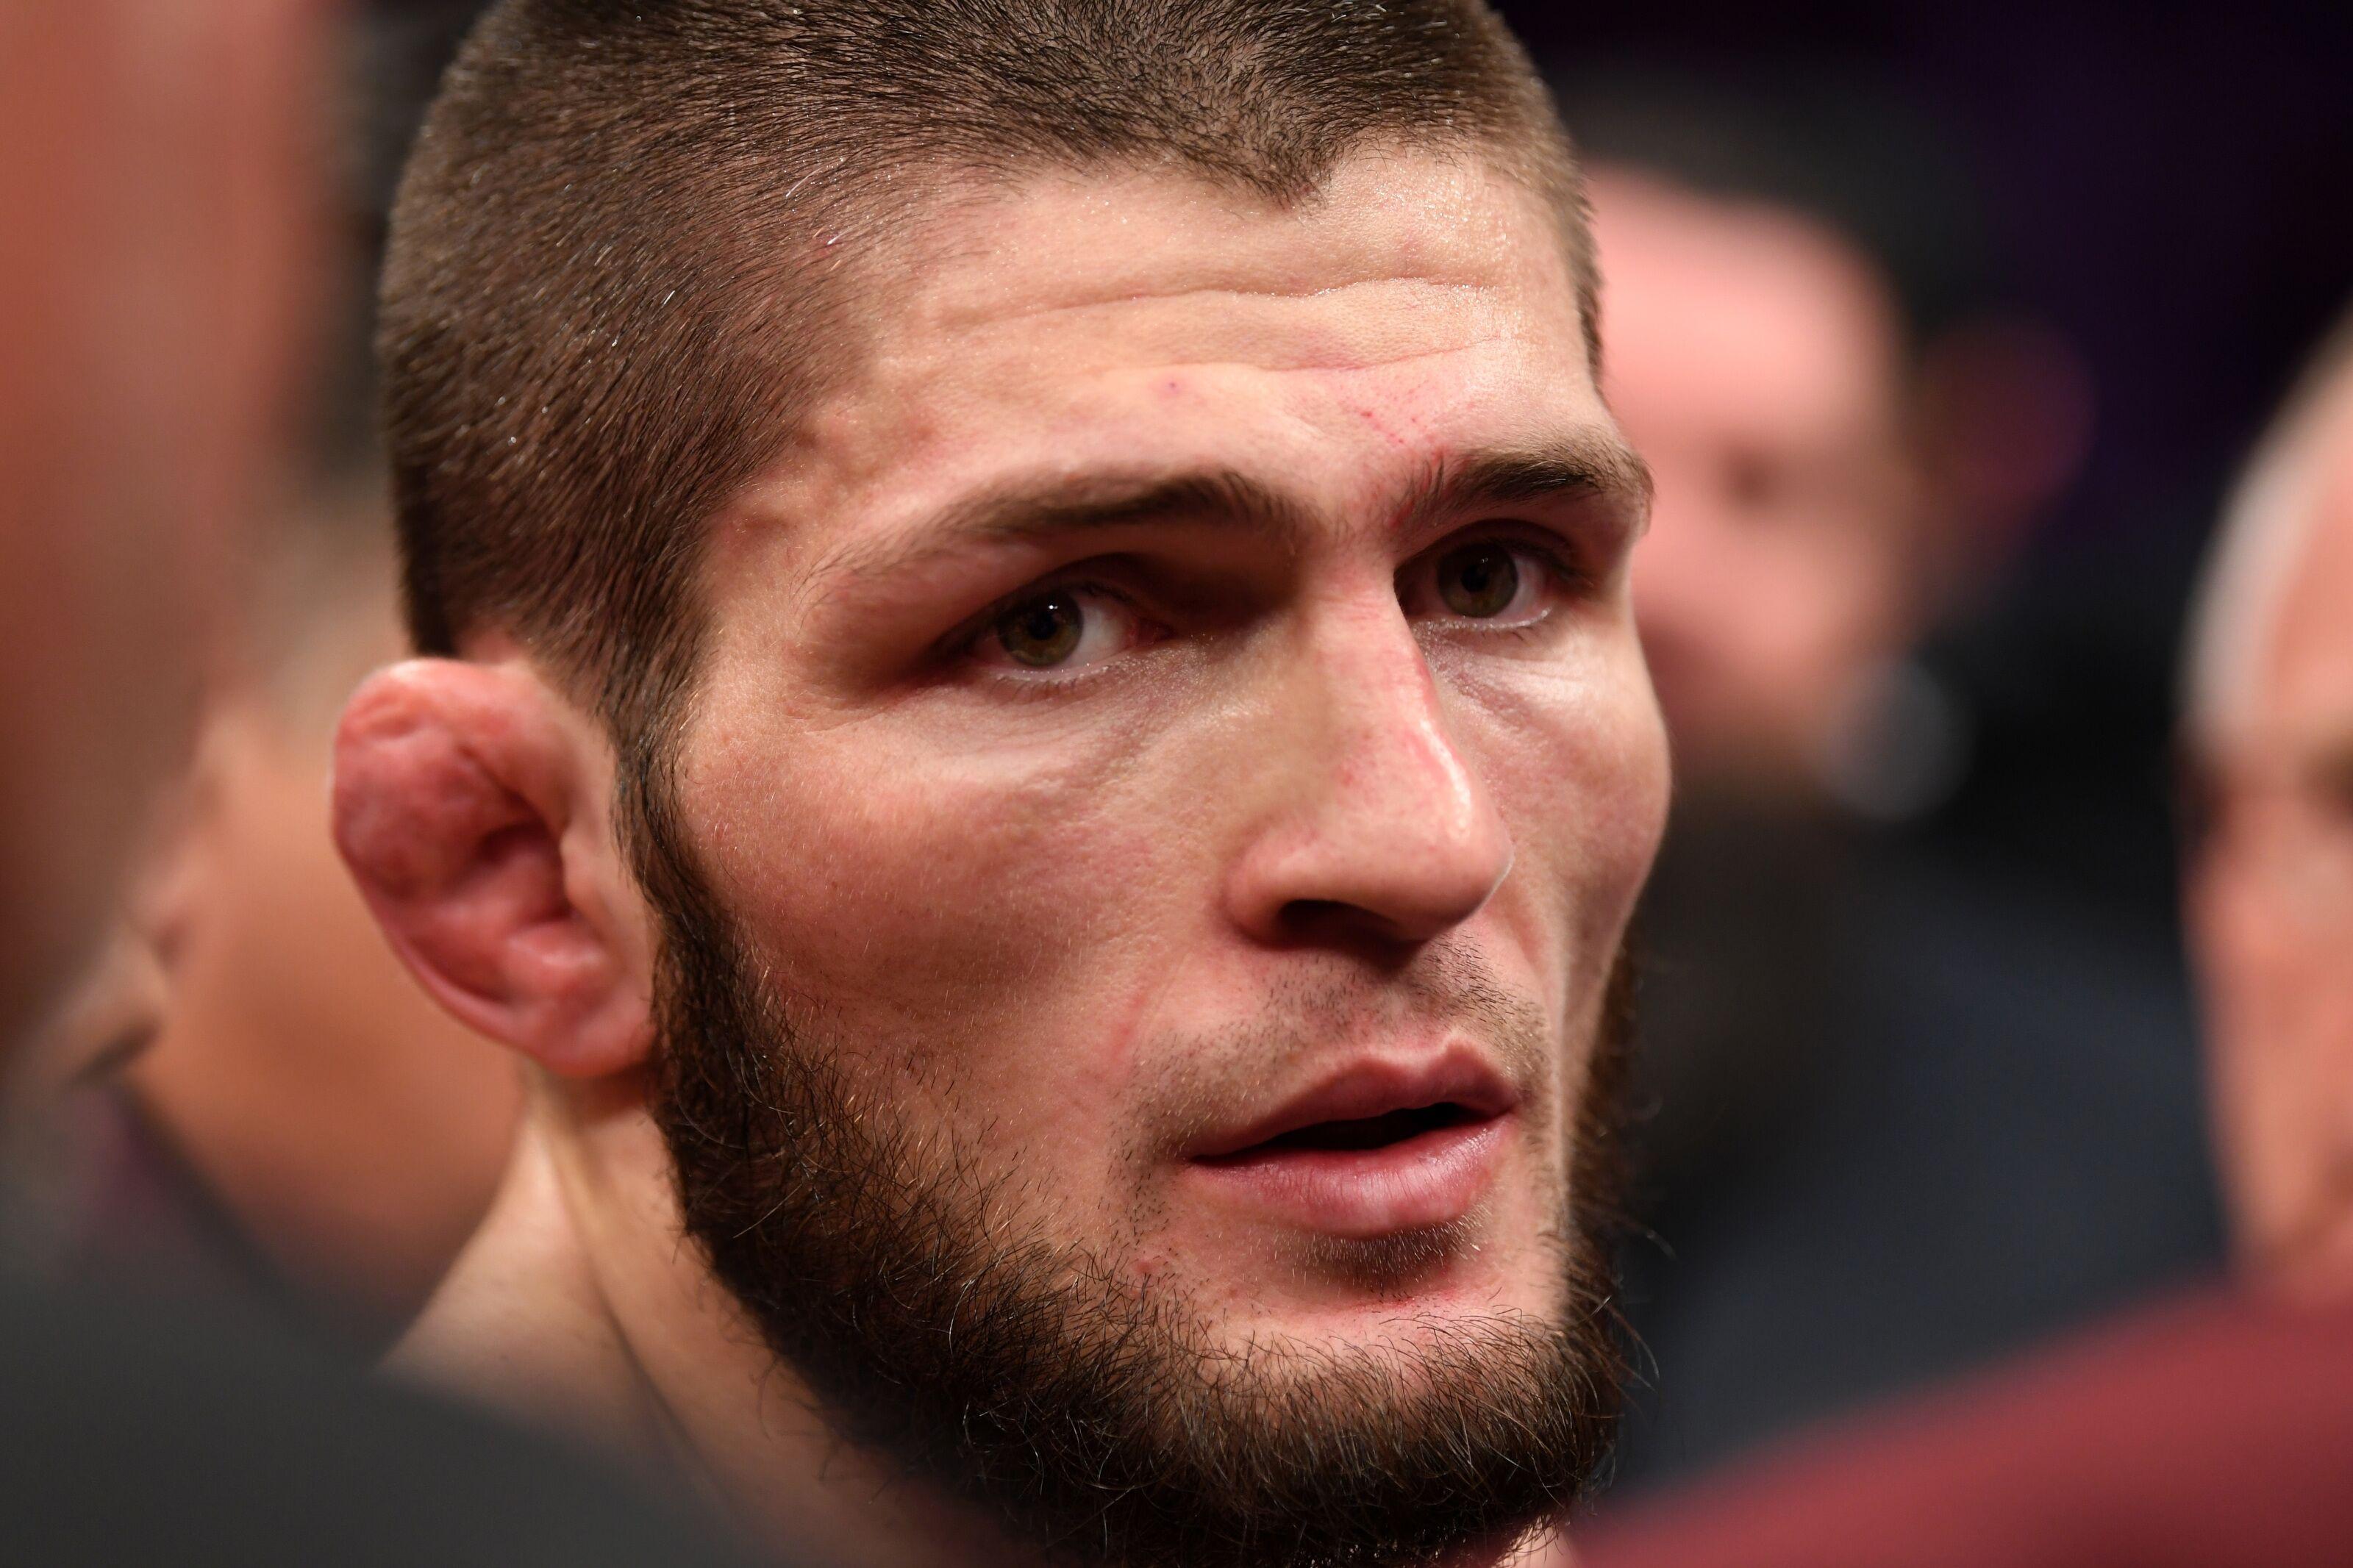 Nate Diaz, Khabib Nurmagomedov separated by security after UFC 239 incident